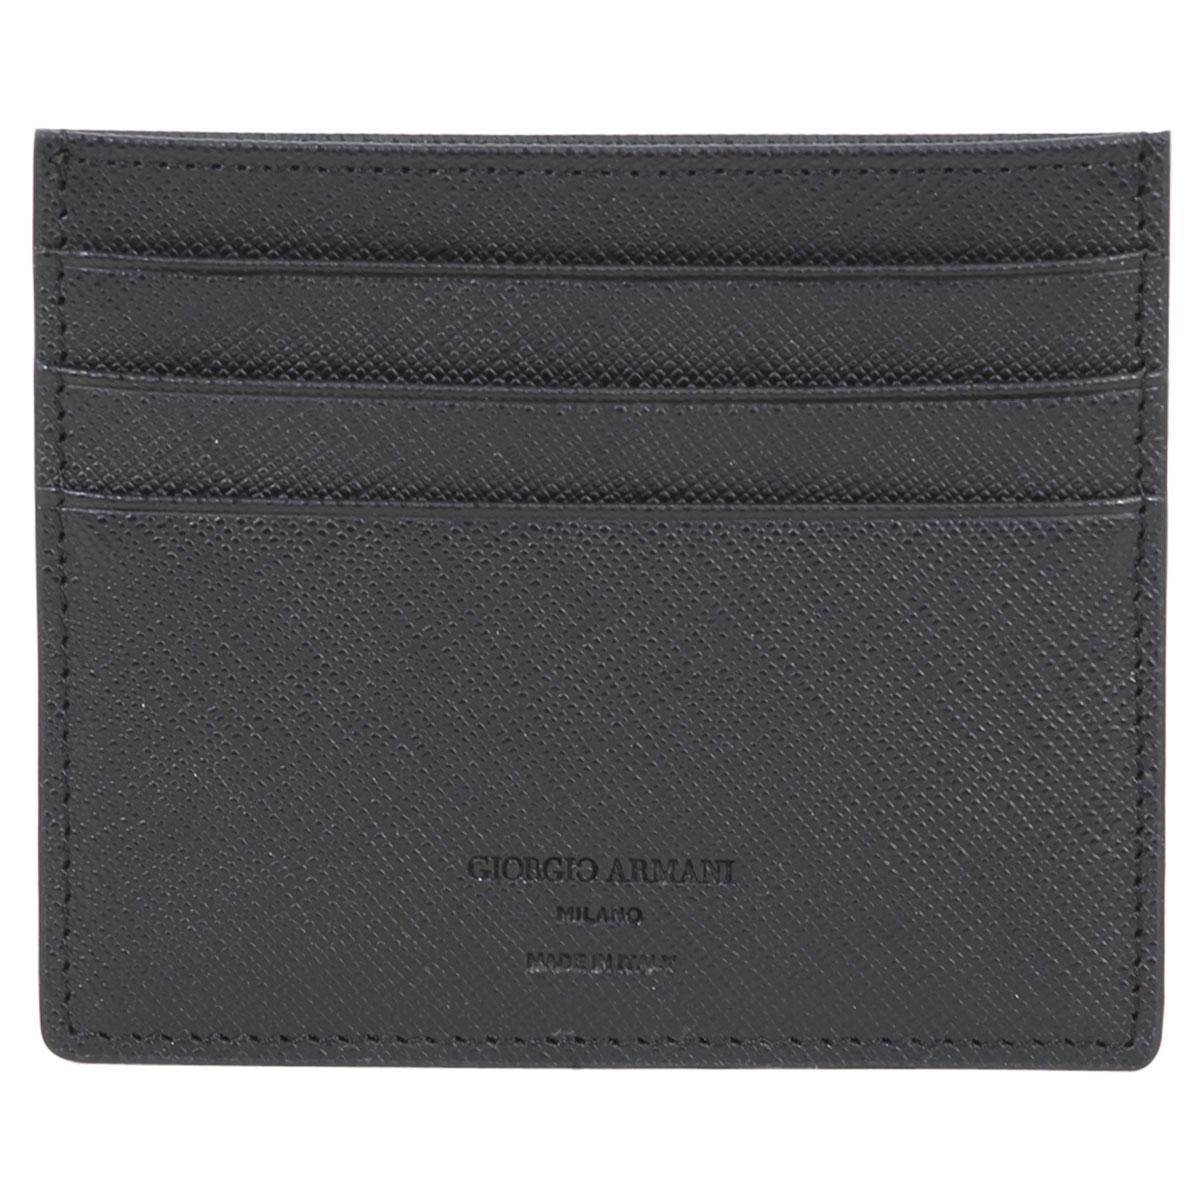 Giorgio Armani Men's Textured Genuine Leather Card Holder Wallet